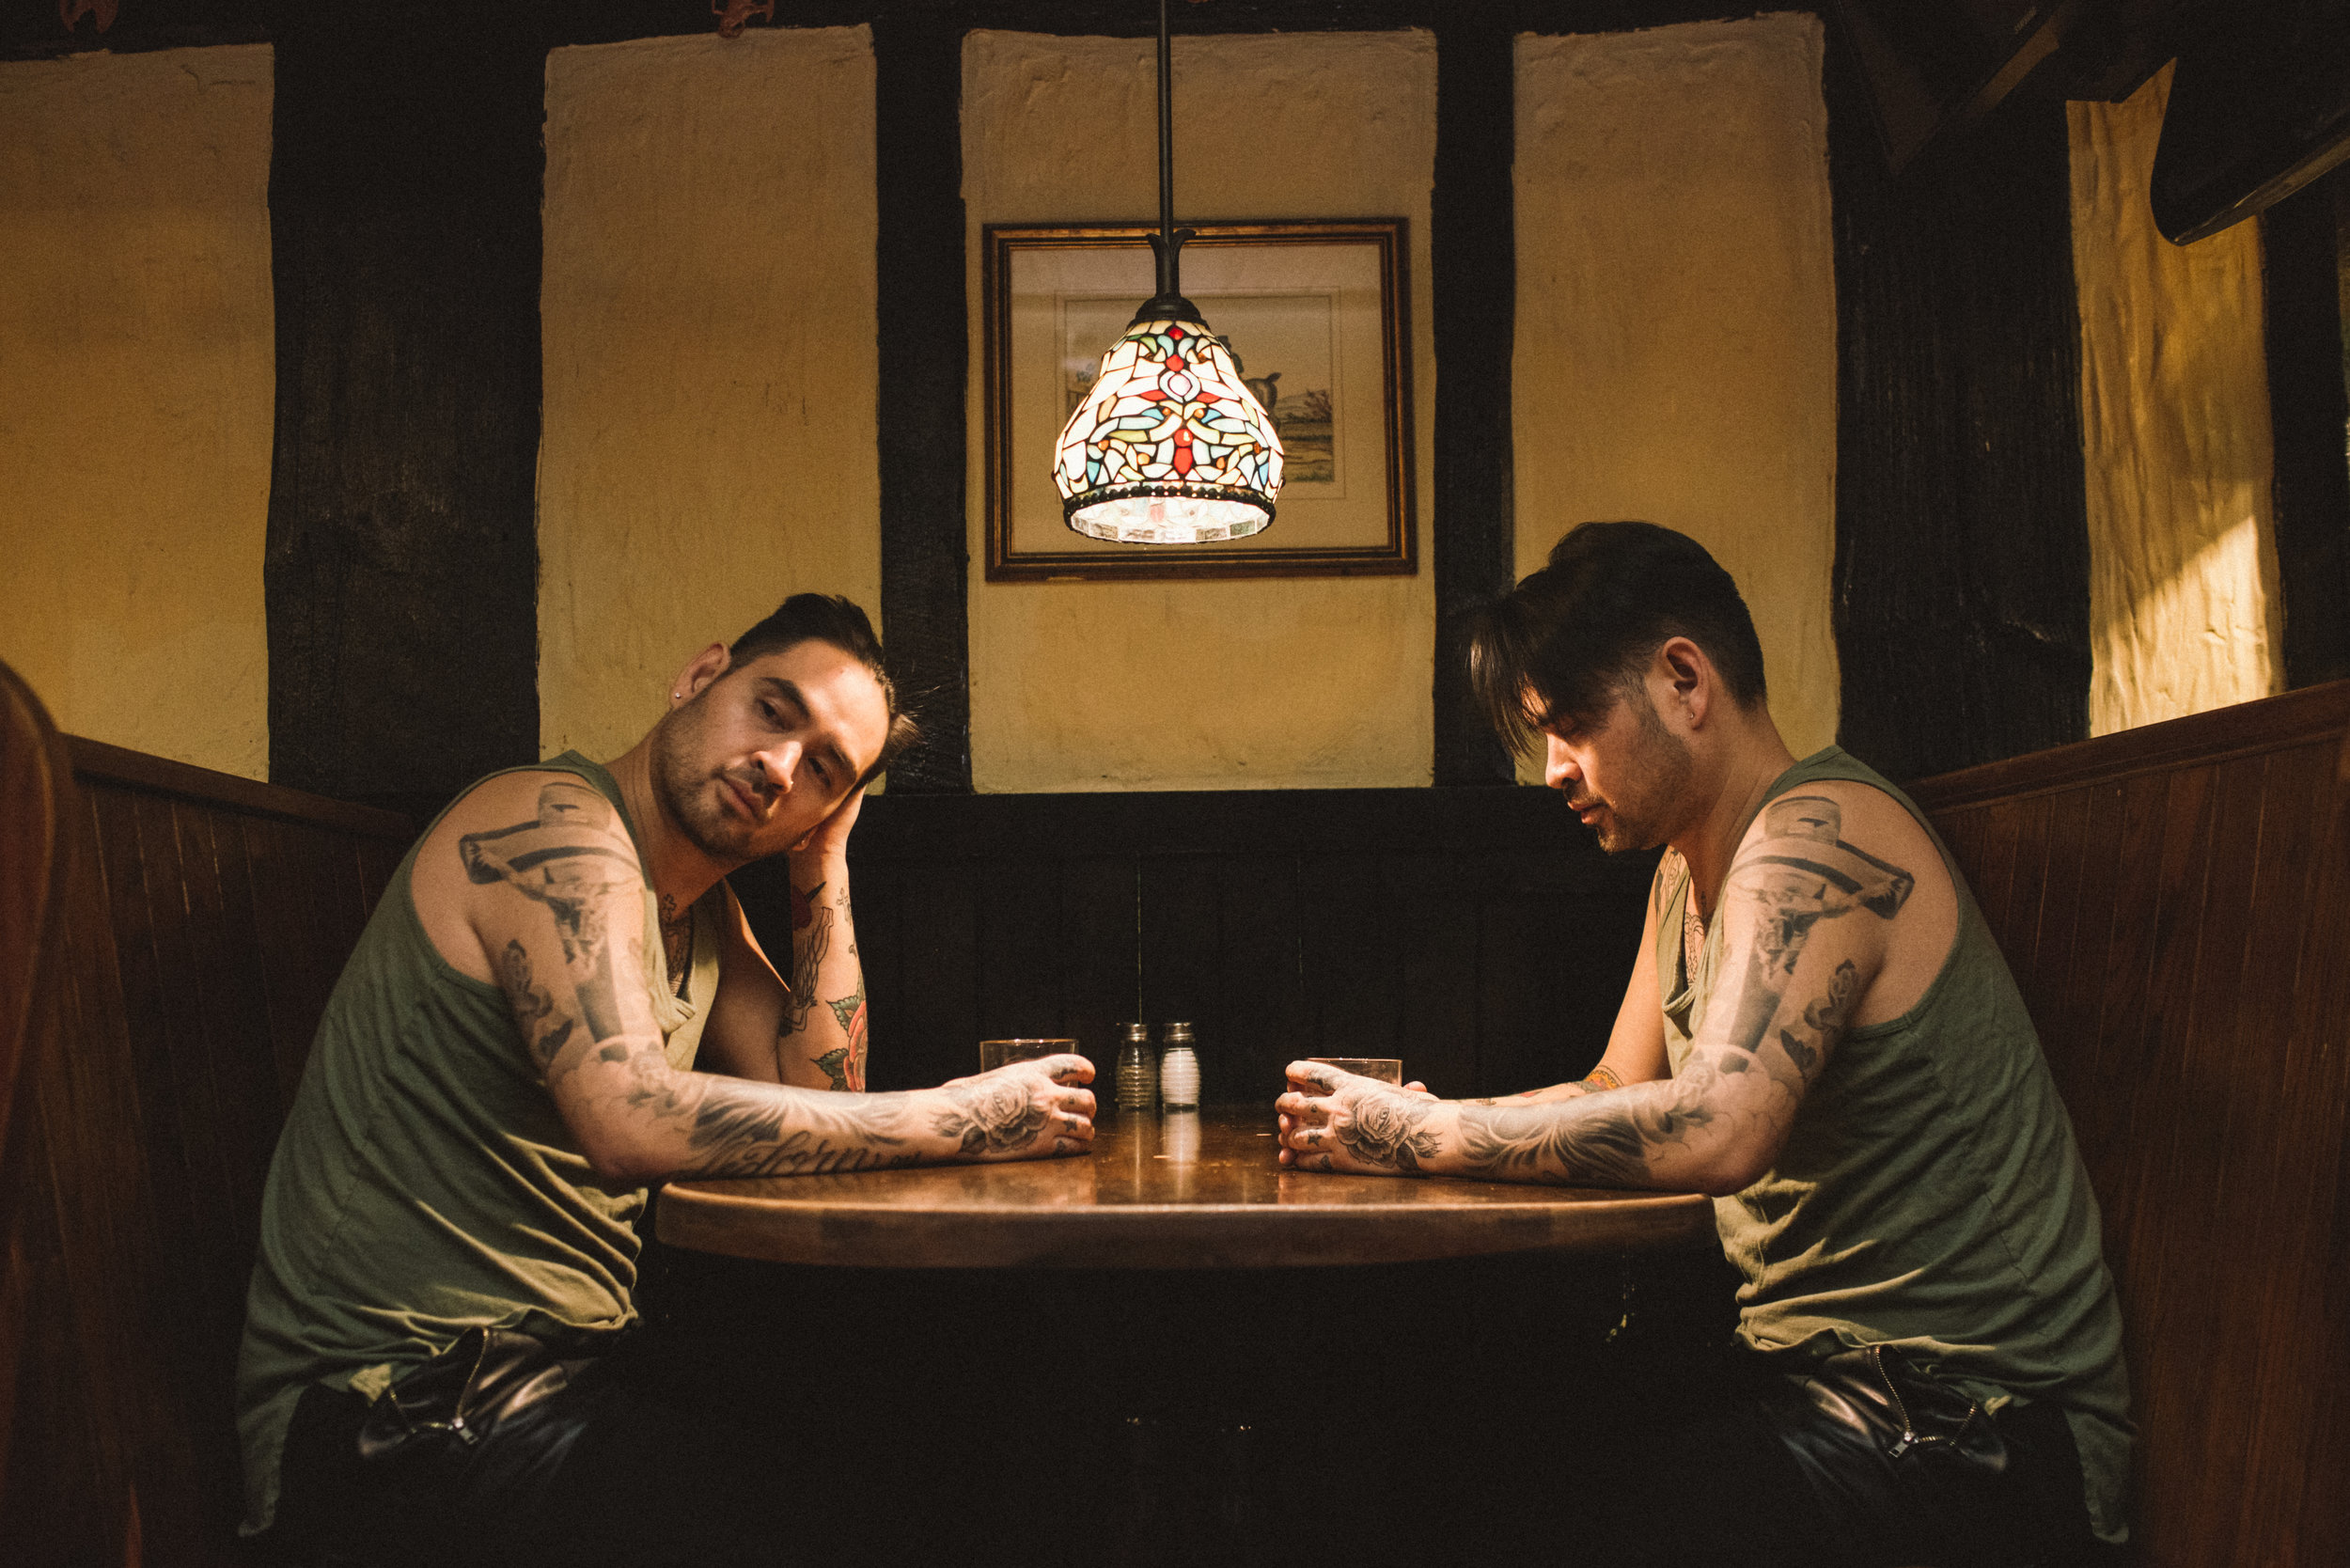 SUYT-Tattoo-Toronto-Adrenaline-Kris-Perez-Scandaleuse-8